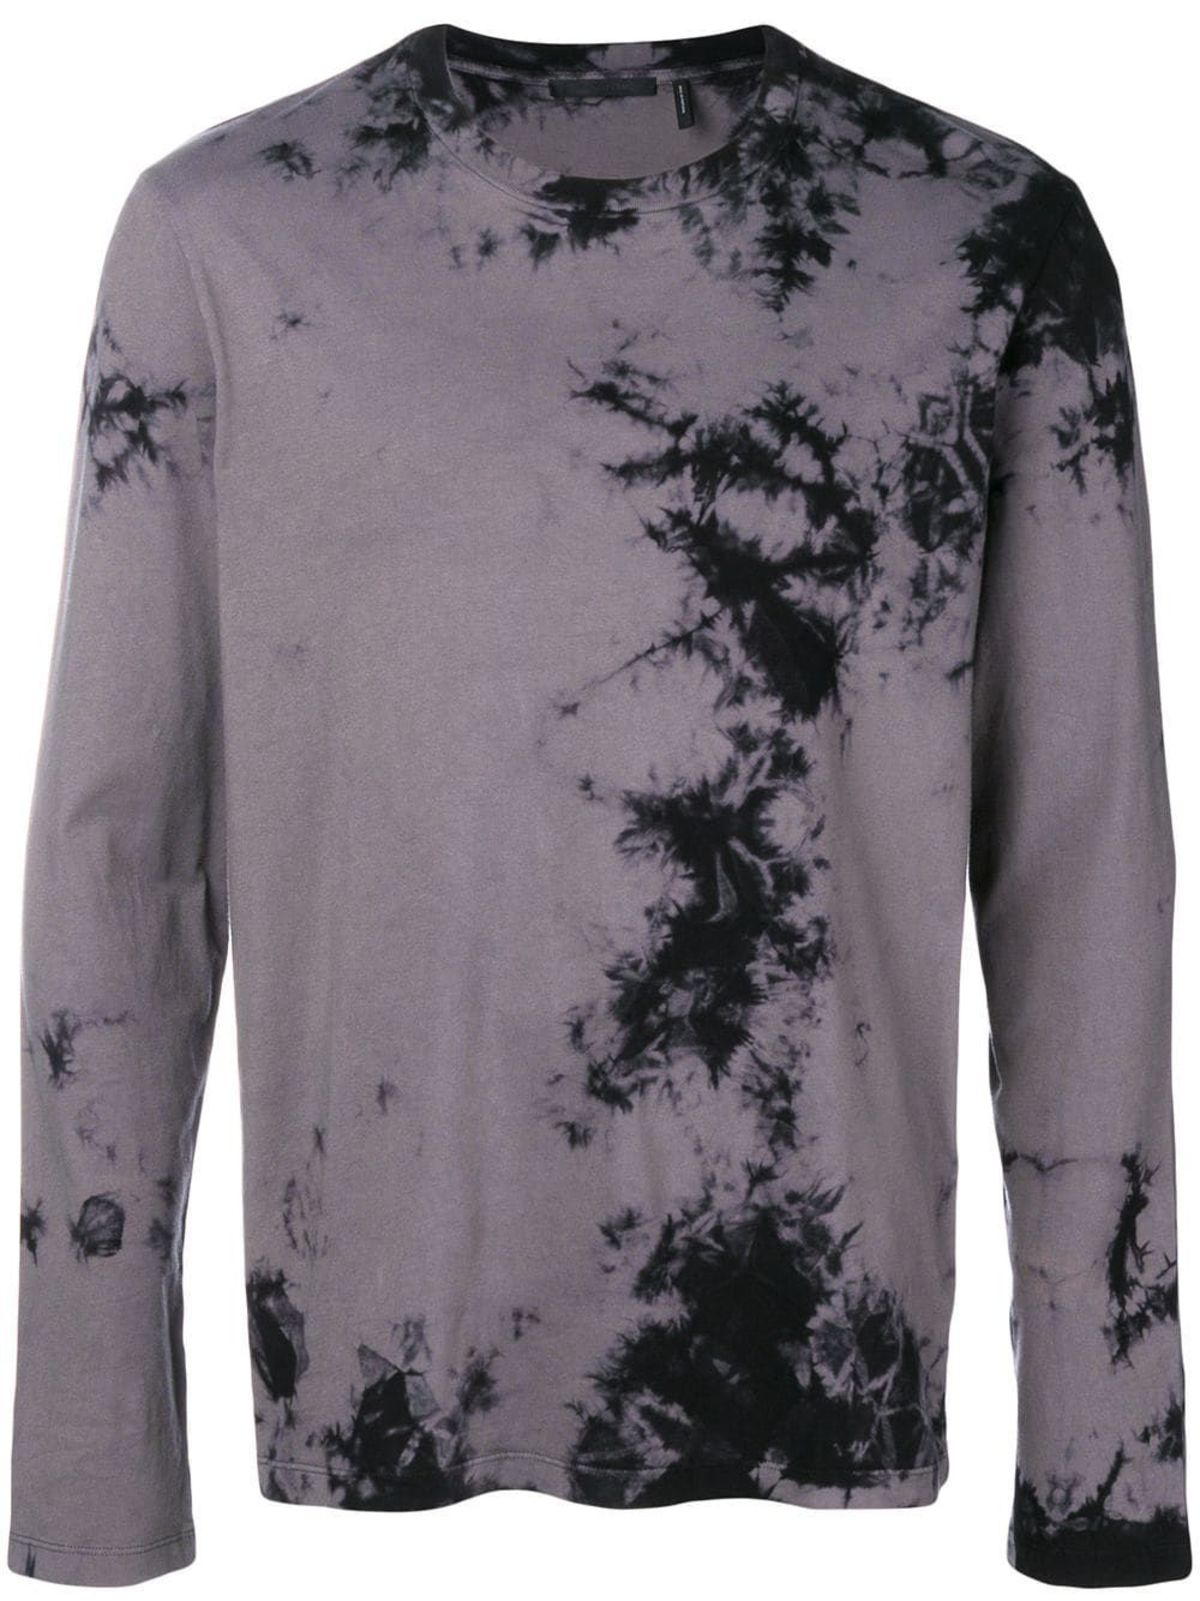 ea7b37f59e2f53 Helmut Lang Tie-Dye Dark Back Logo Long Sleeve T-Shirt - Grey Black ...